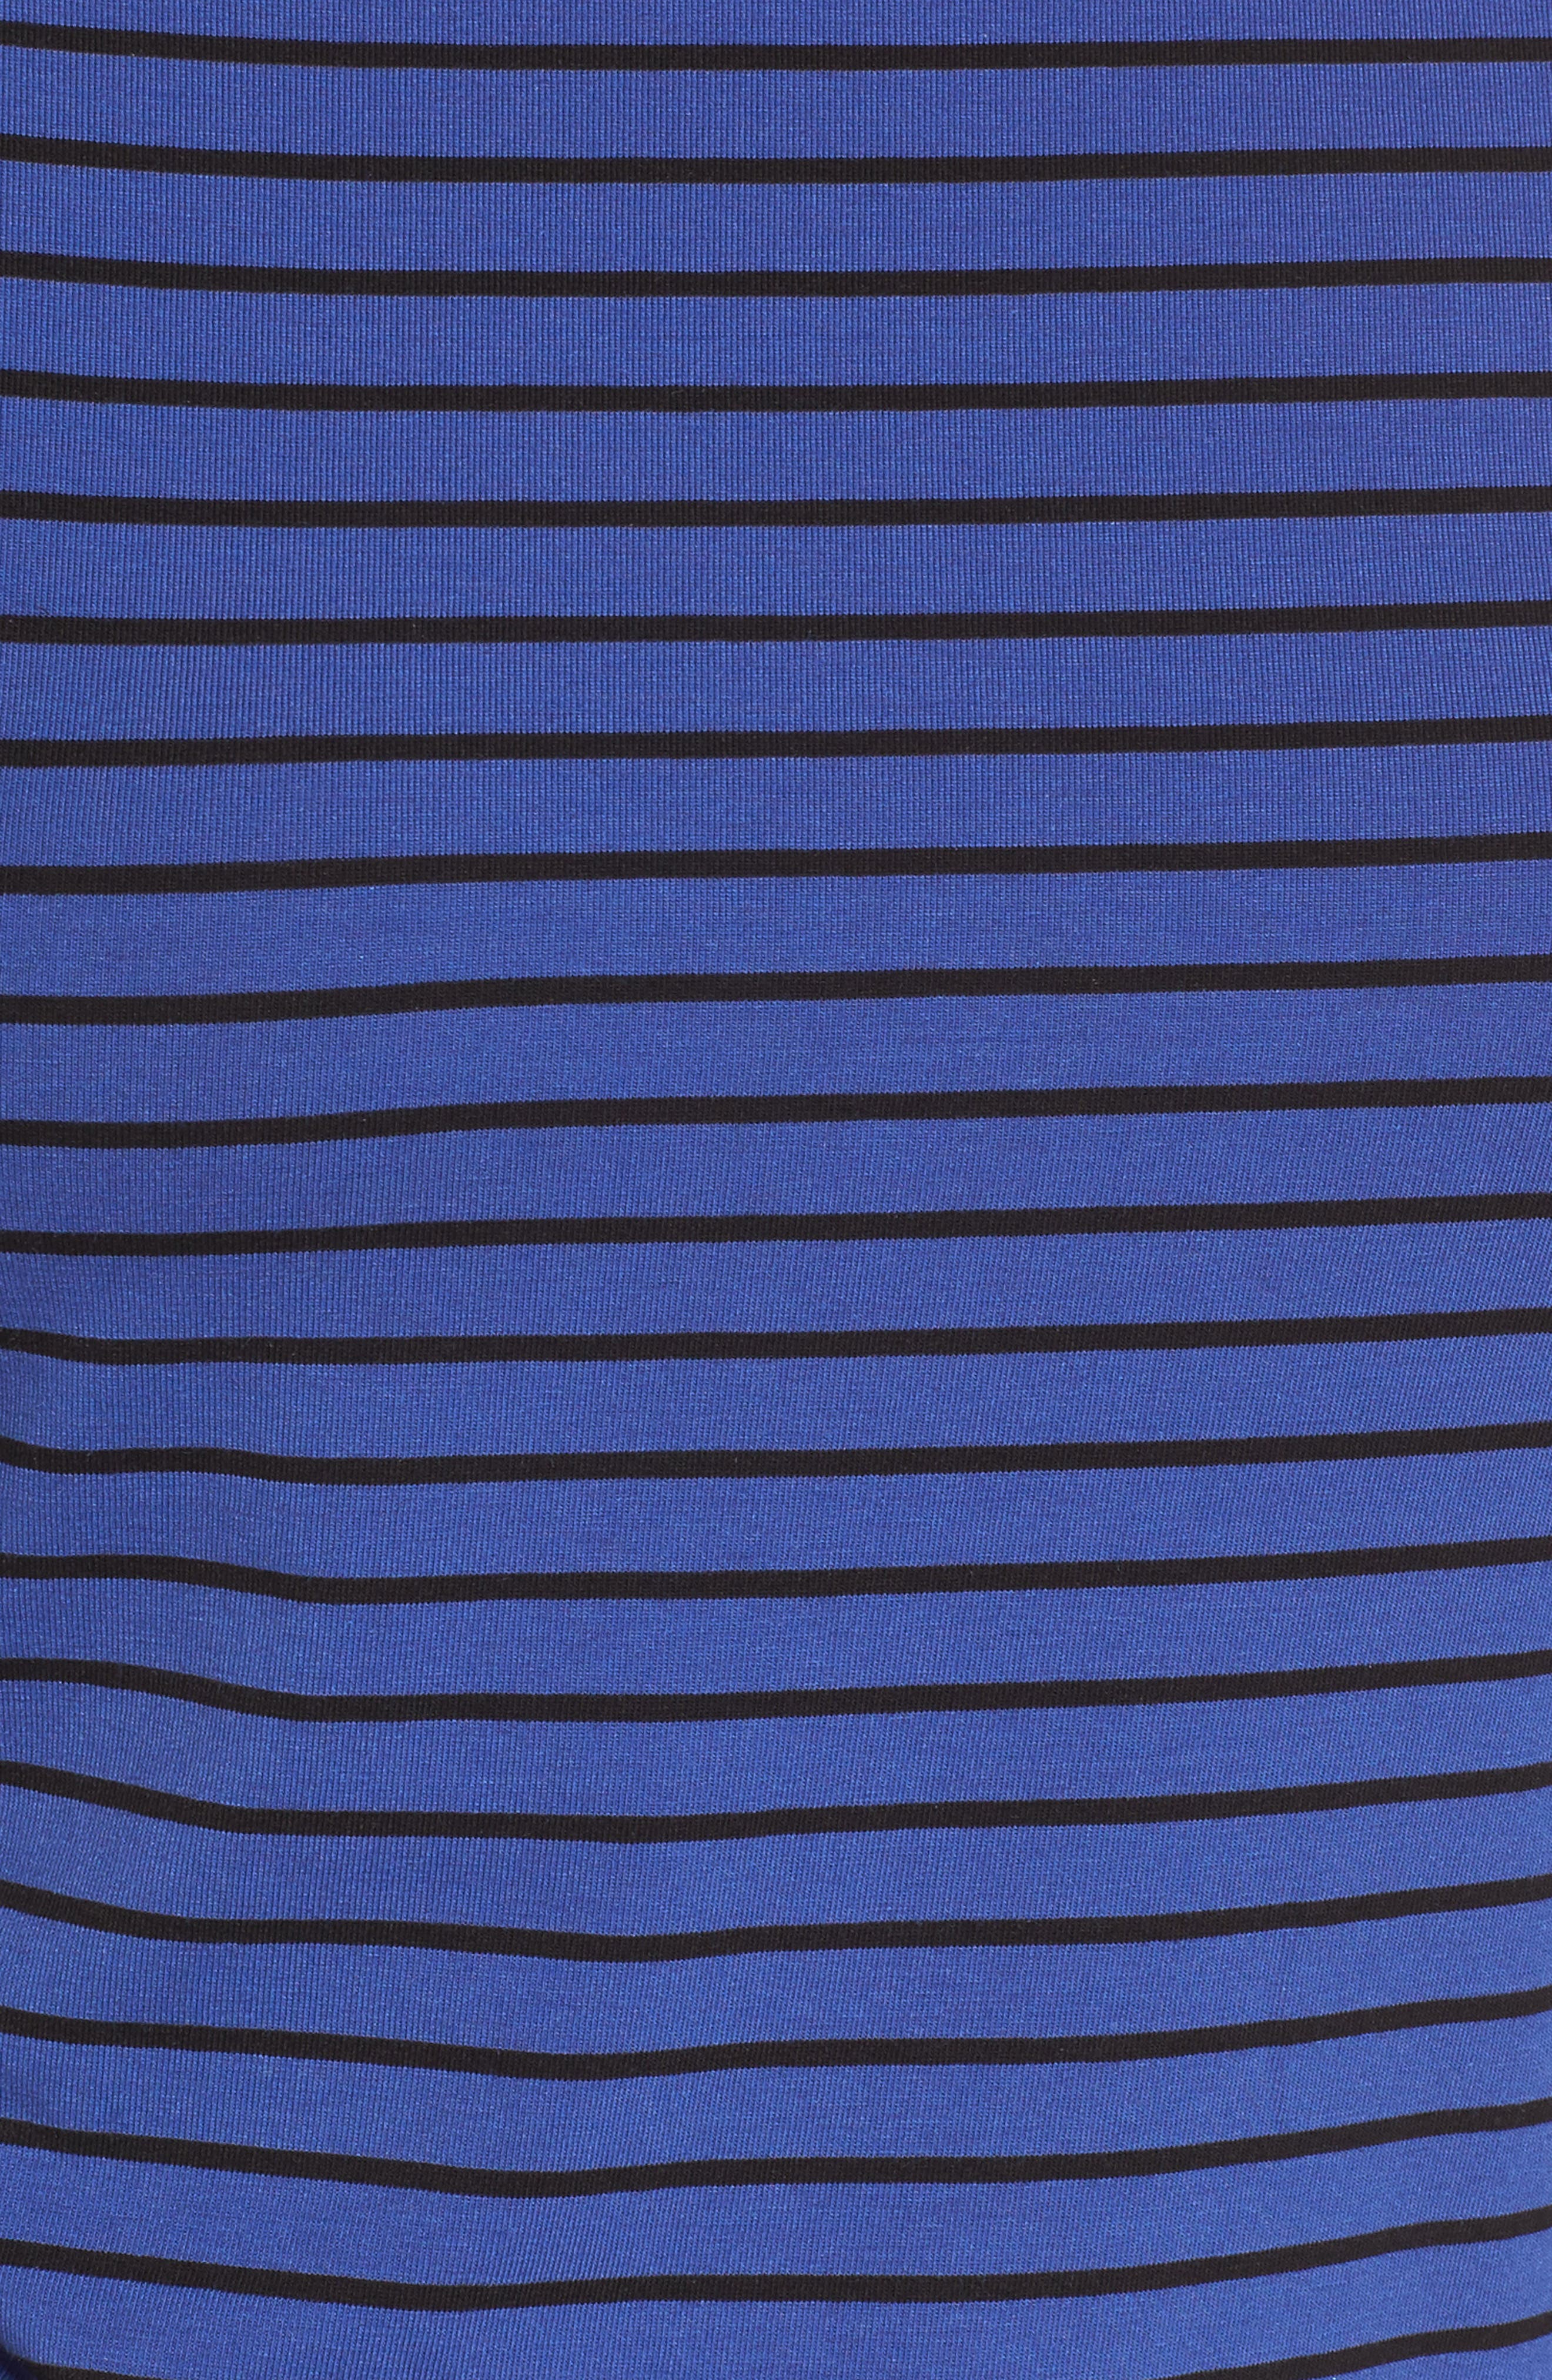 Stripe Knit Boatneck Top,                             Alternate thumbnail 5, color,                             Okeeffe Blue/ Black